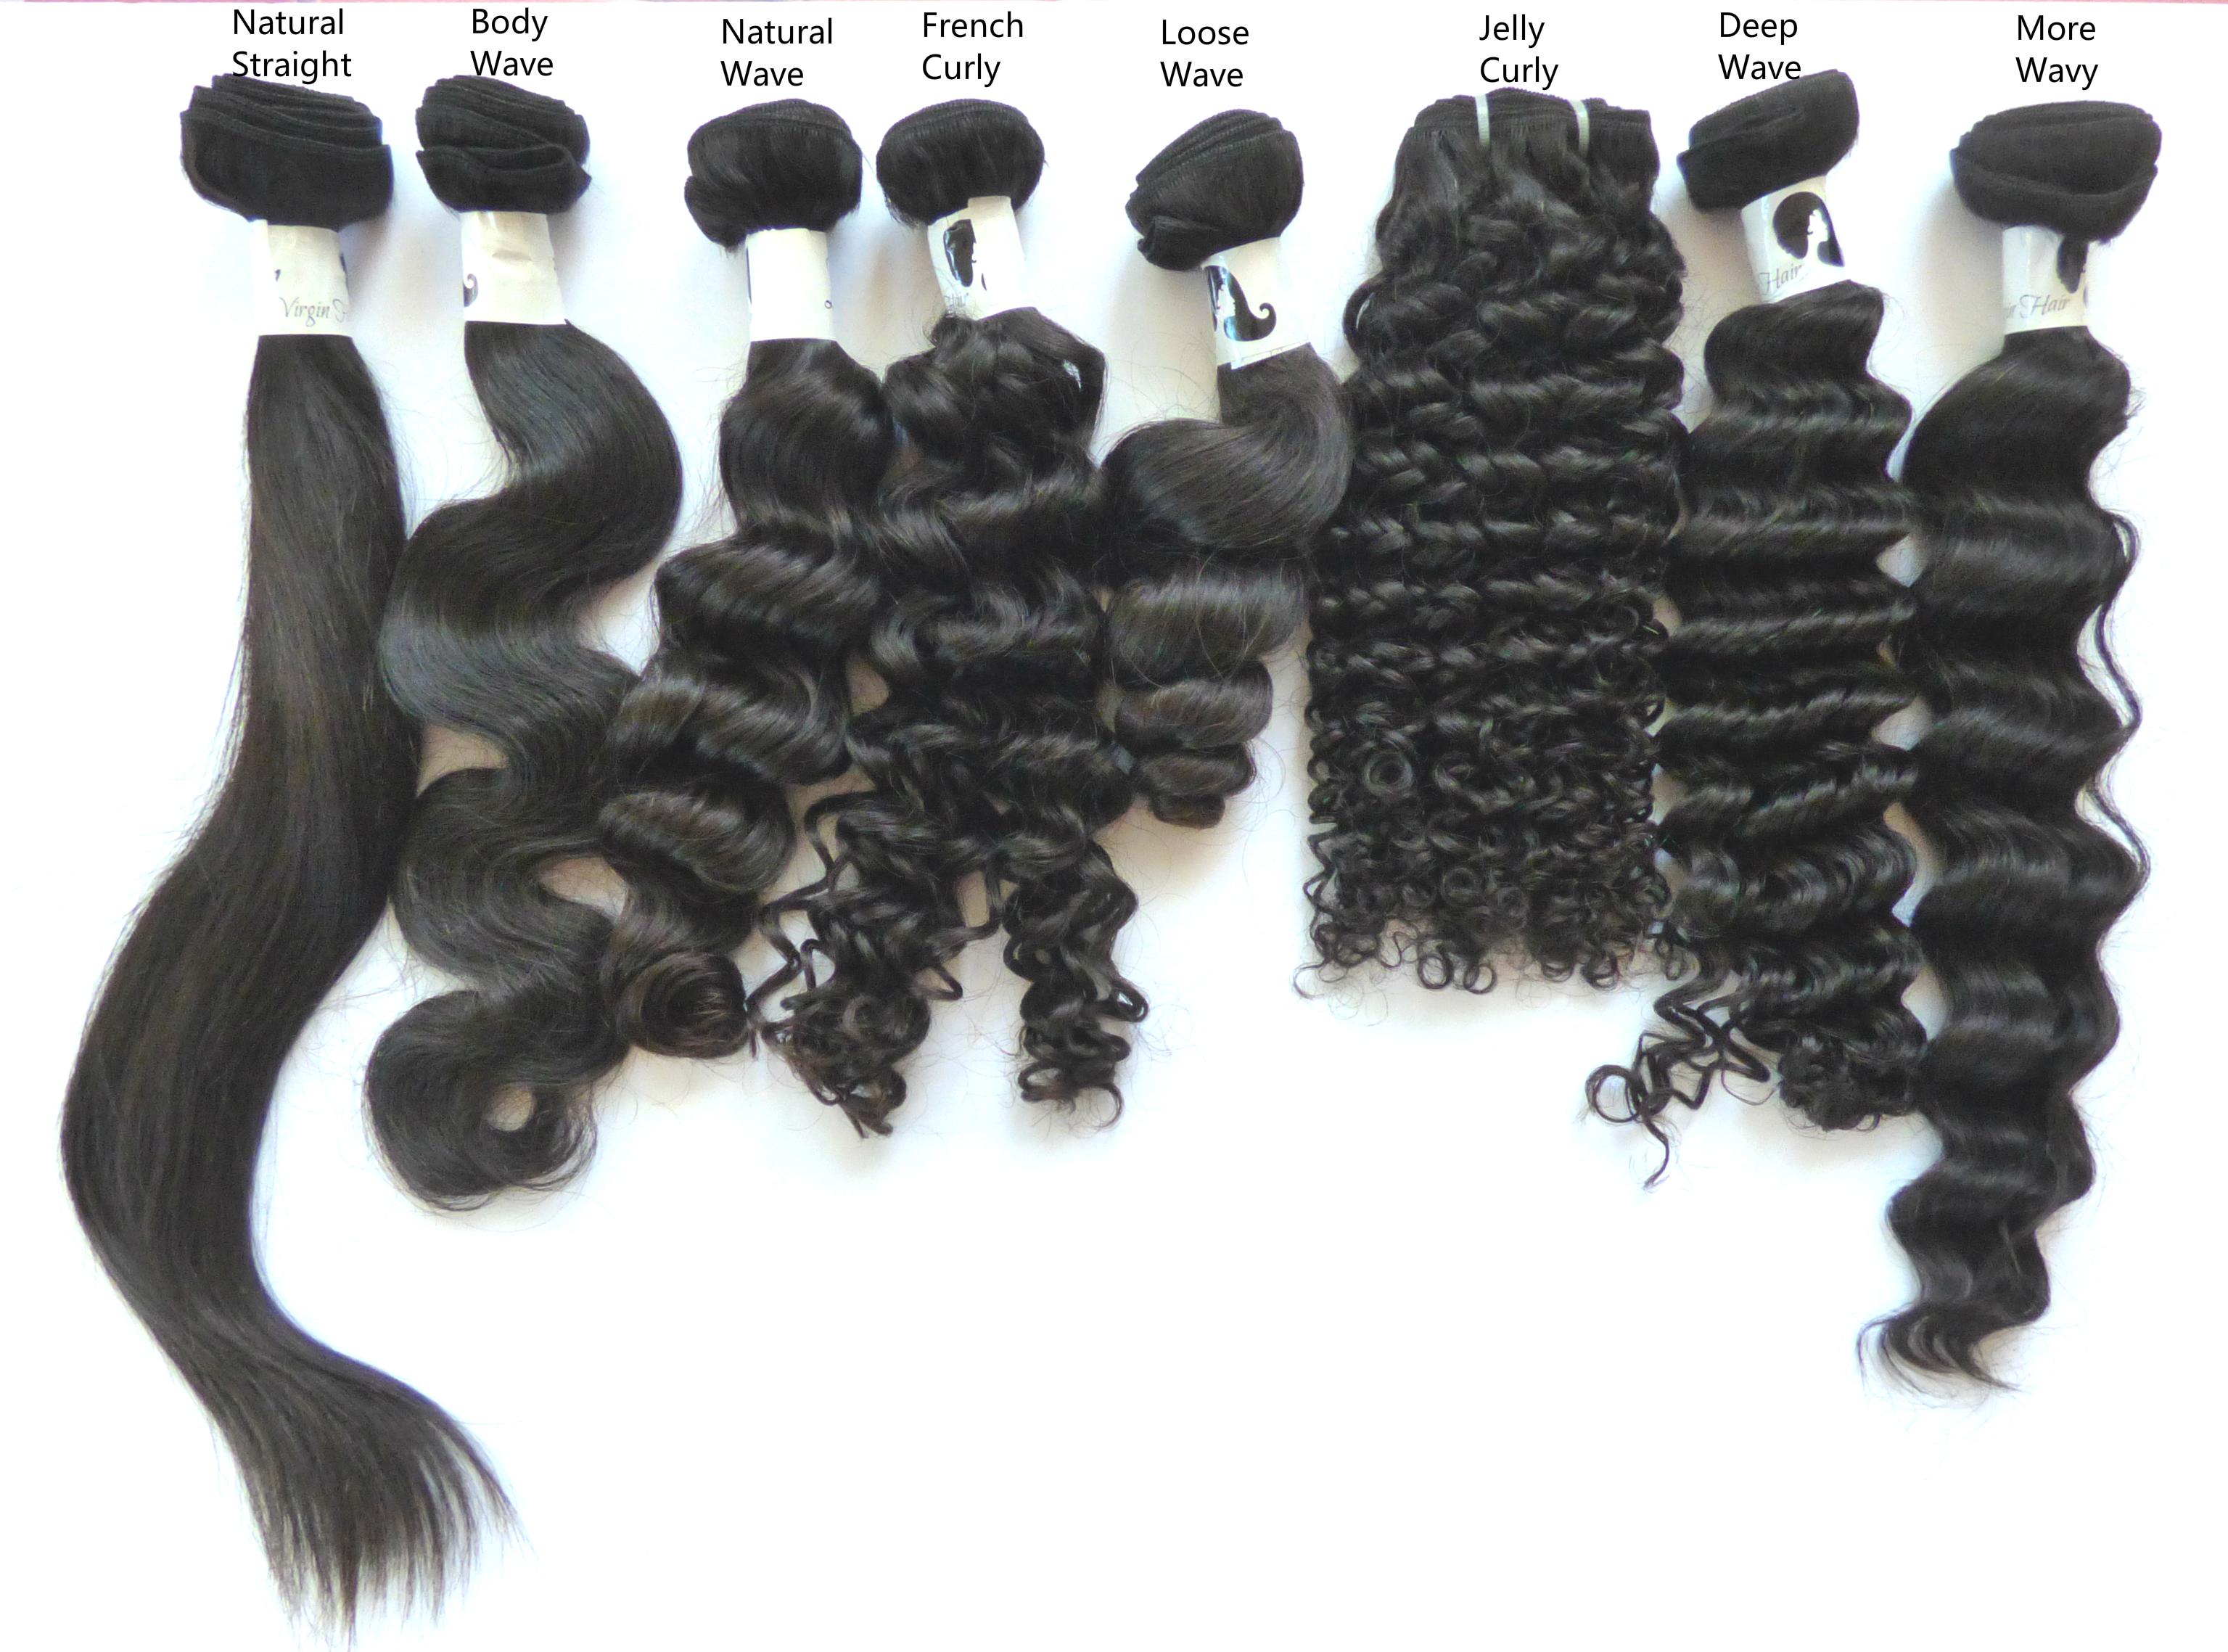 Wholesale All Textures per kilo or 10 bundles – Icy Virgin Hair